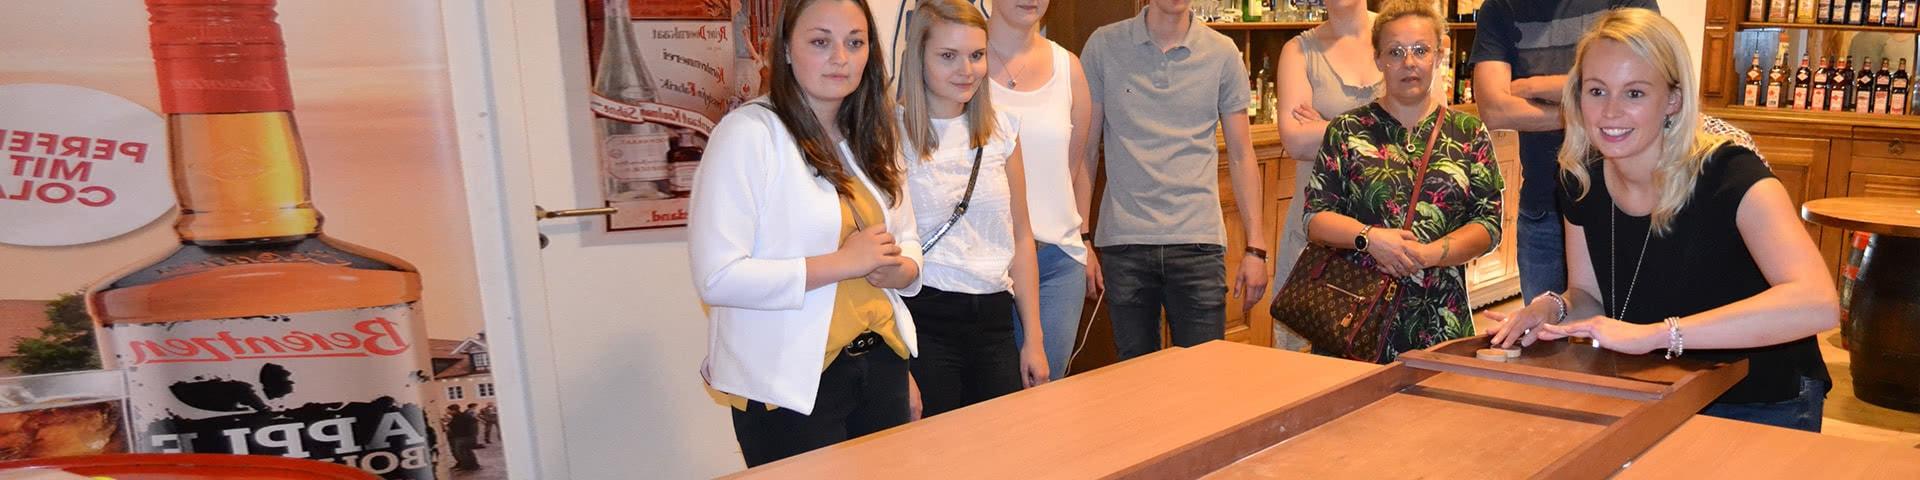 Gruppe bem Gudium im Berentzen Hof in Haselünne